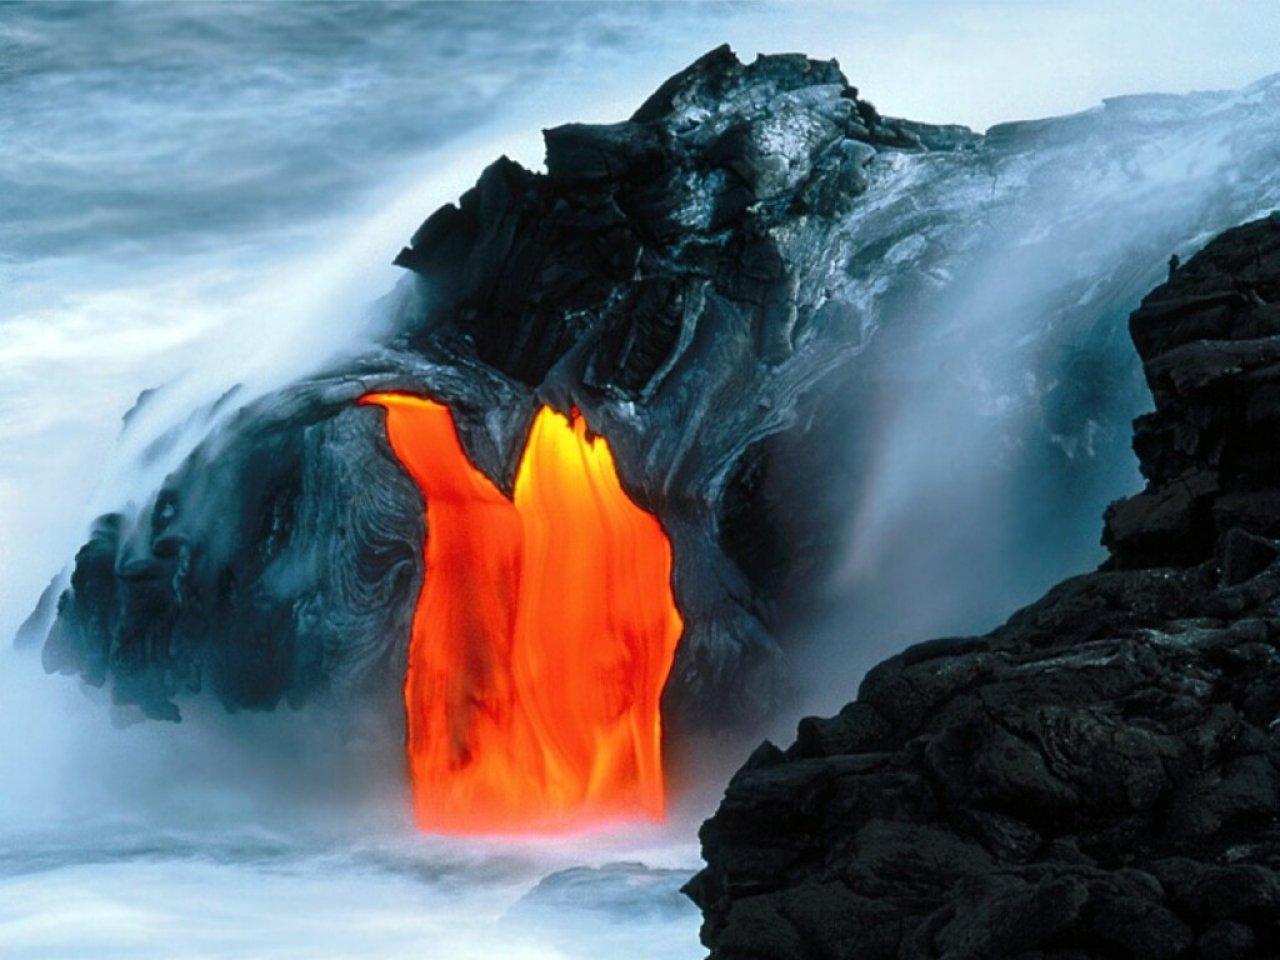 http://4.bp.blogspot.com/_Zsh7hDlg7E4/S9yLhwPemfI/AAAAAAAAABw/_uokrjlMfF0/s1600/Kilauea_Volcano_Lava_Flow_Hawaii_free_computer_desktop_wallpaper_1280.jpg